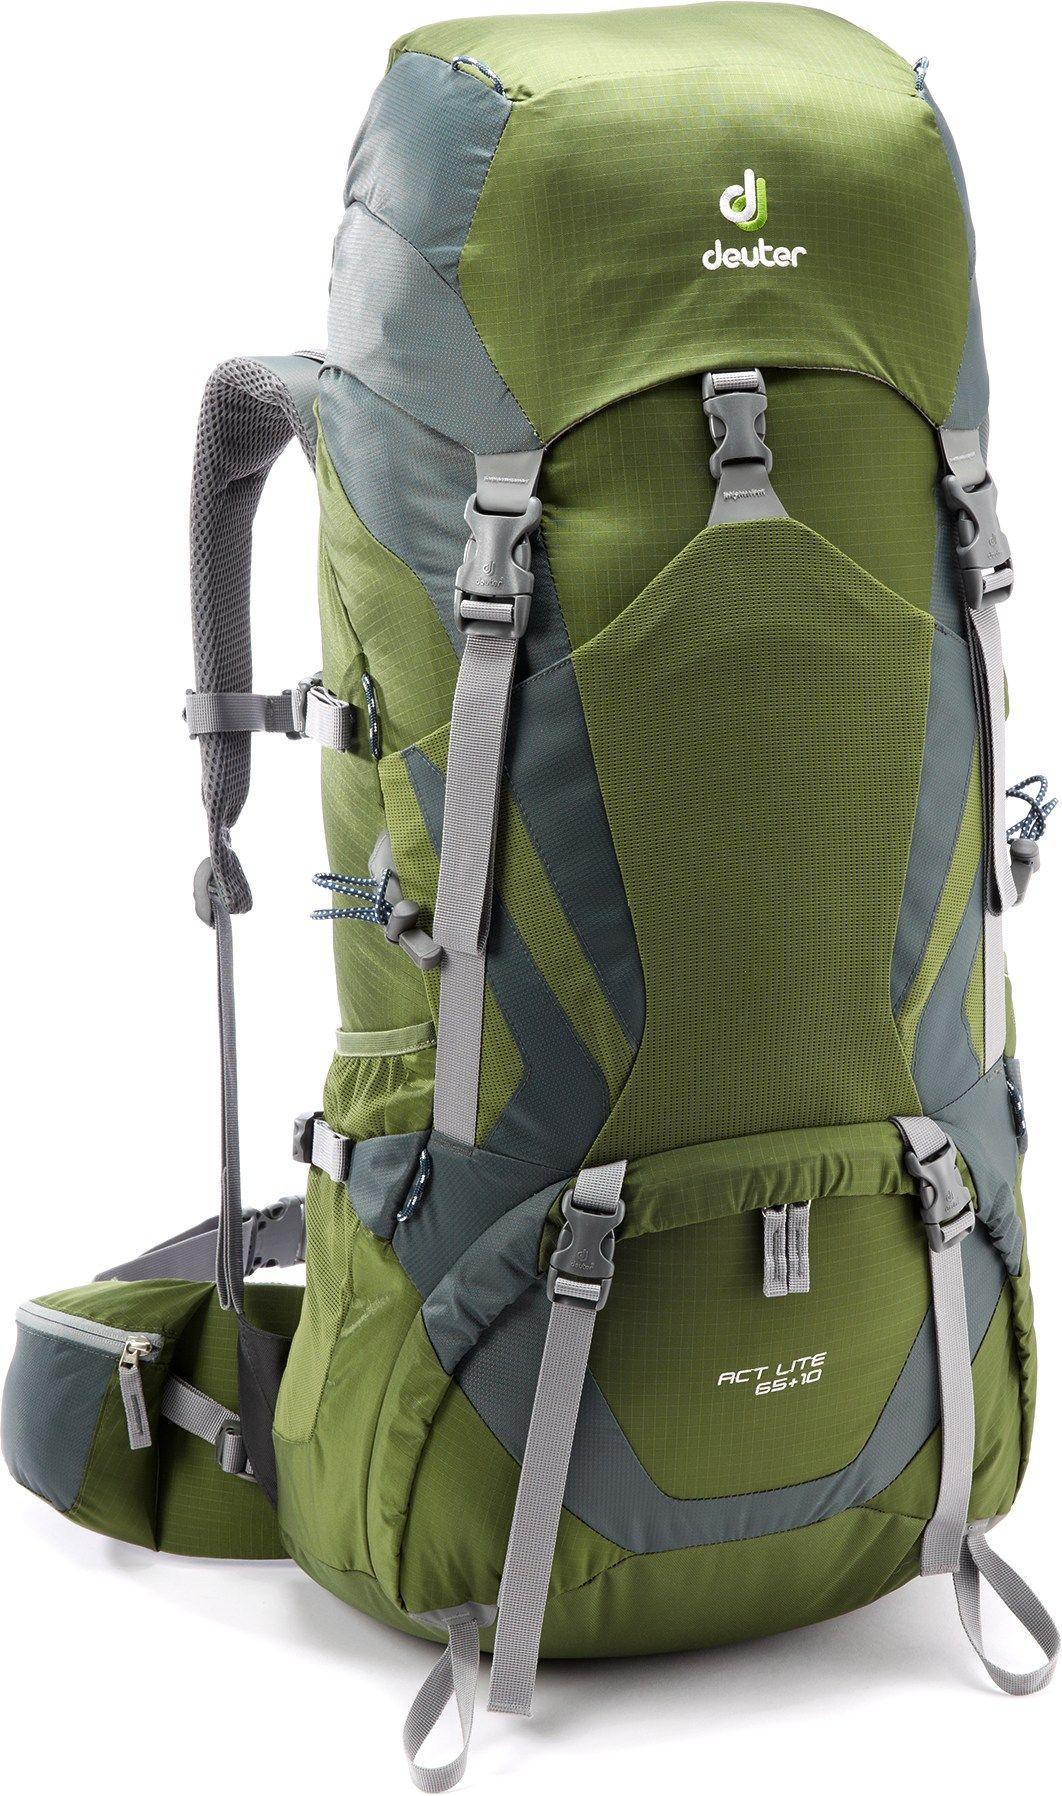 Deuter Act Lite 65 10 Pack Men S Camping Equipment Rental Backpack Brands Backpacking Travel